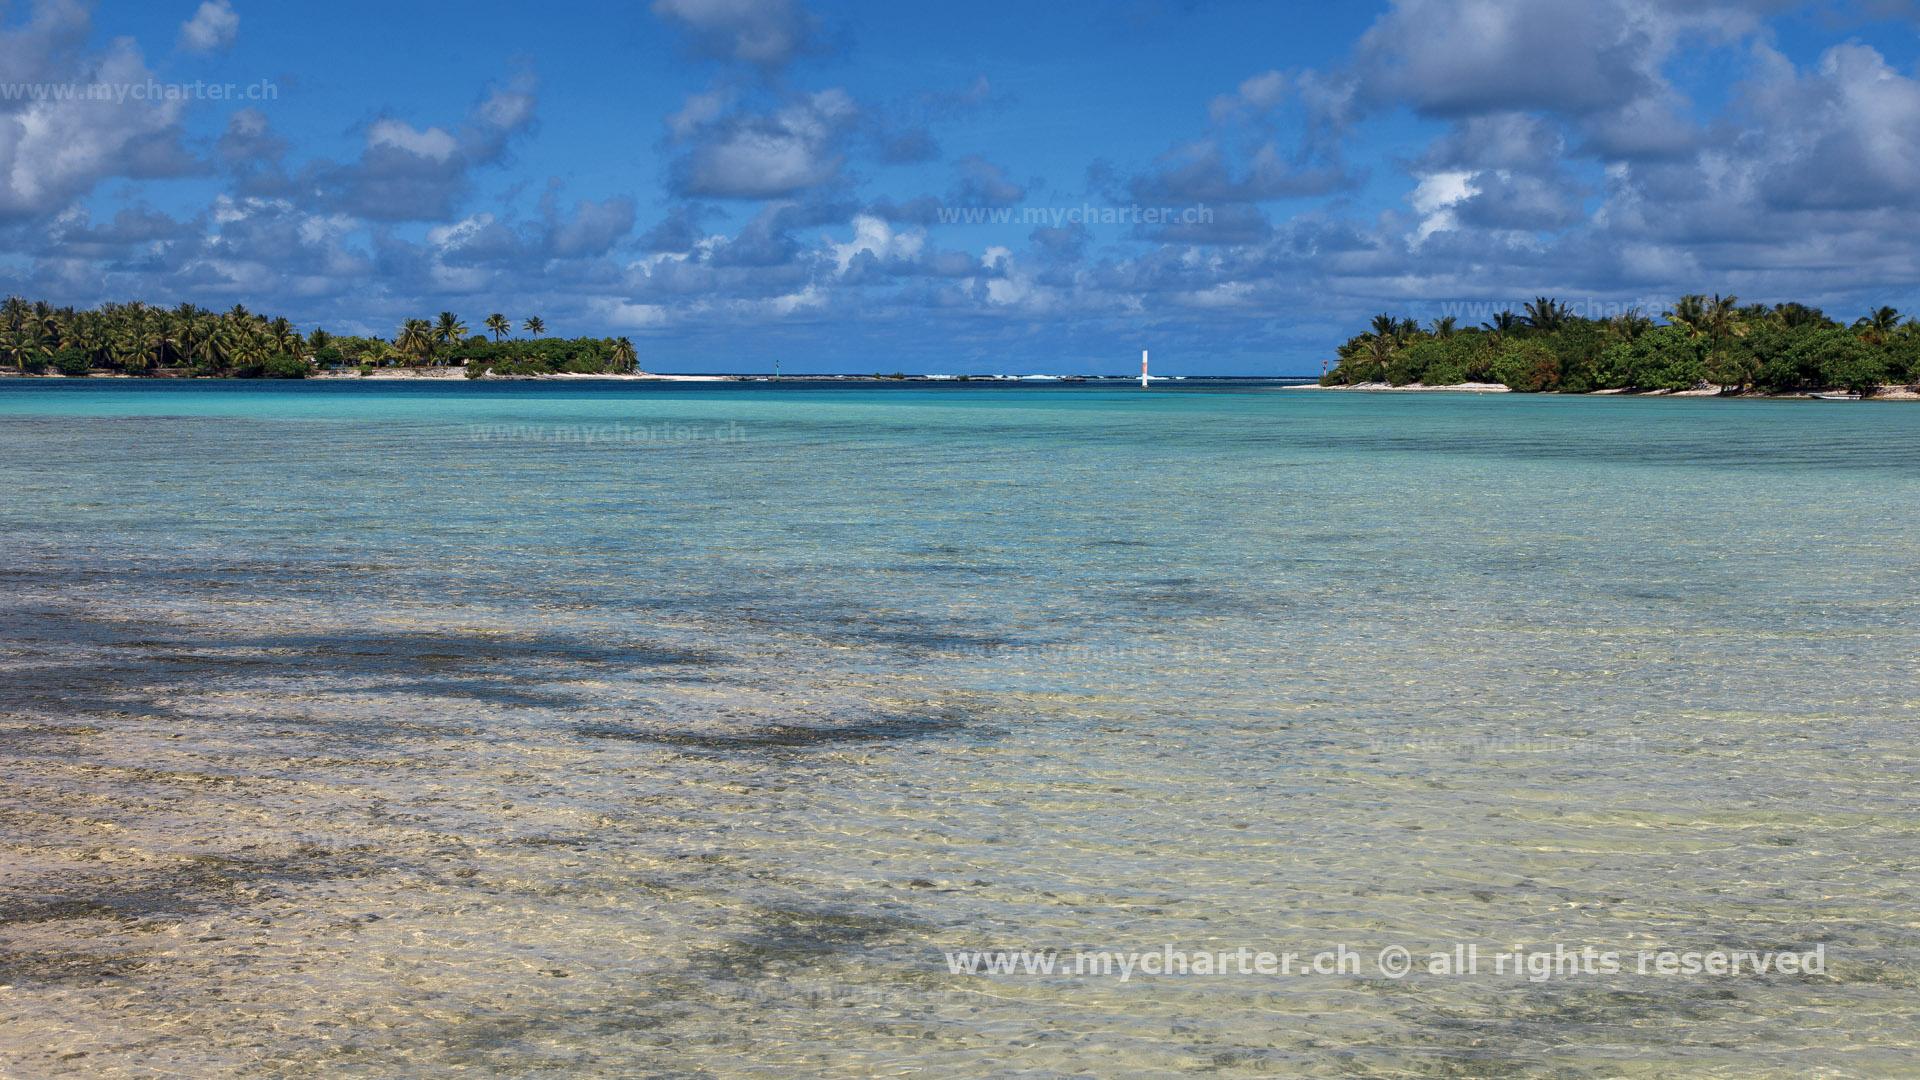 crewed charter Tahiti Insel Maupiti Lagoon